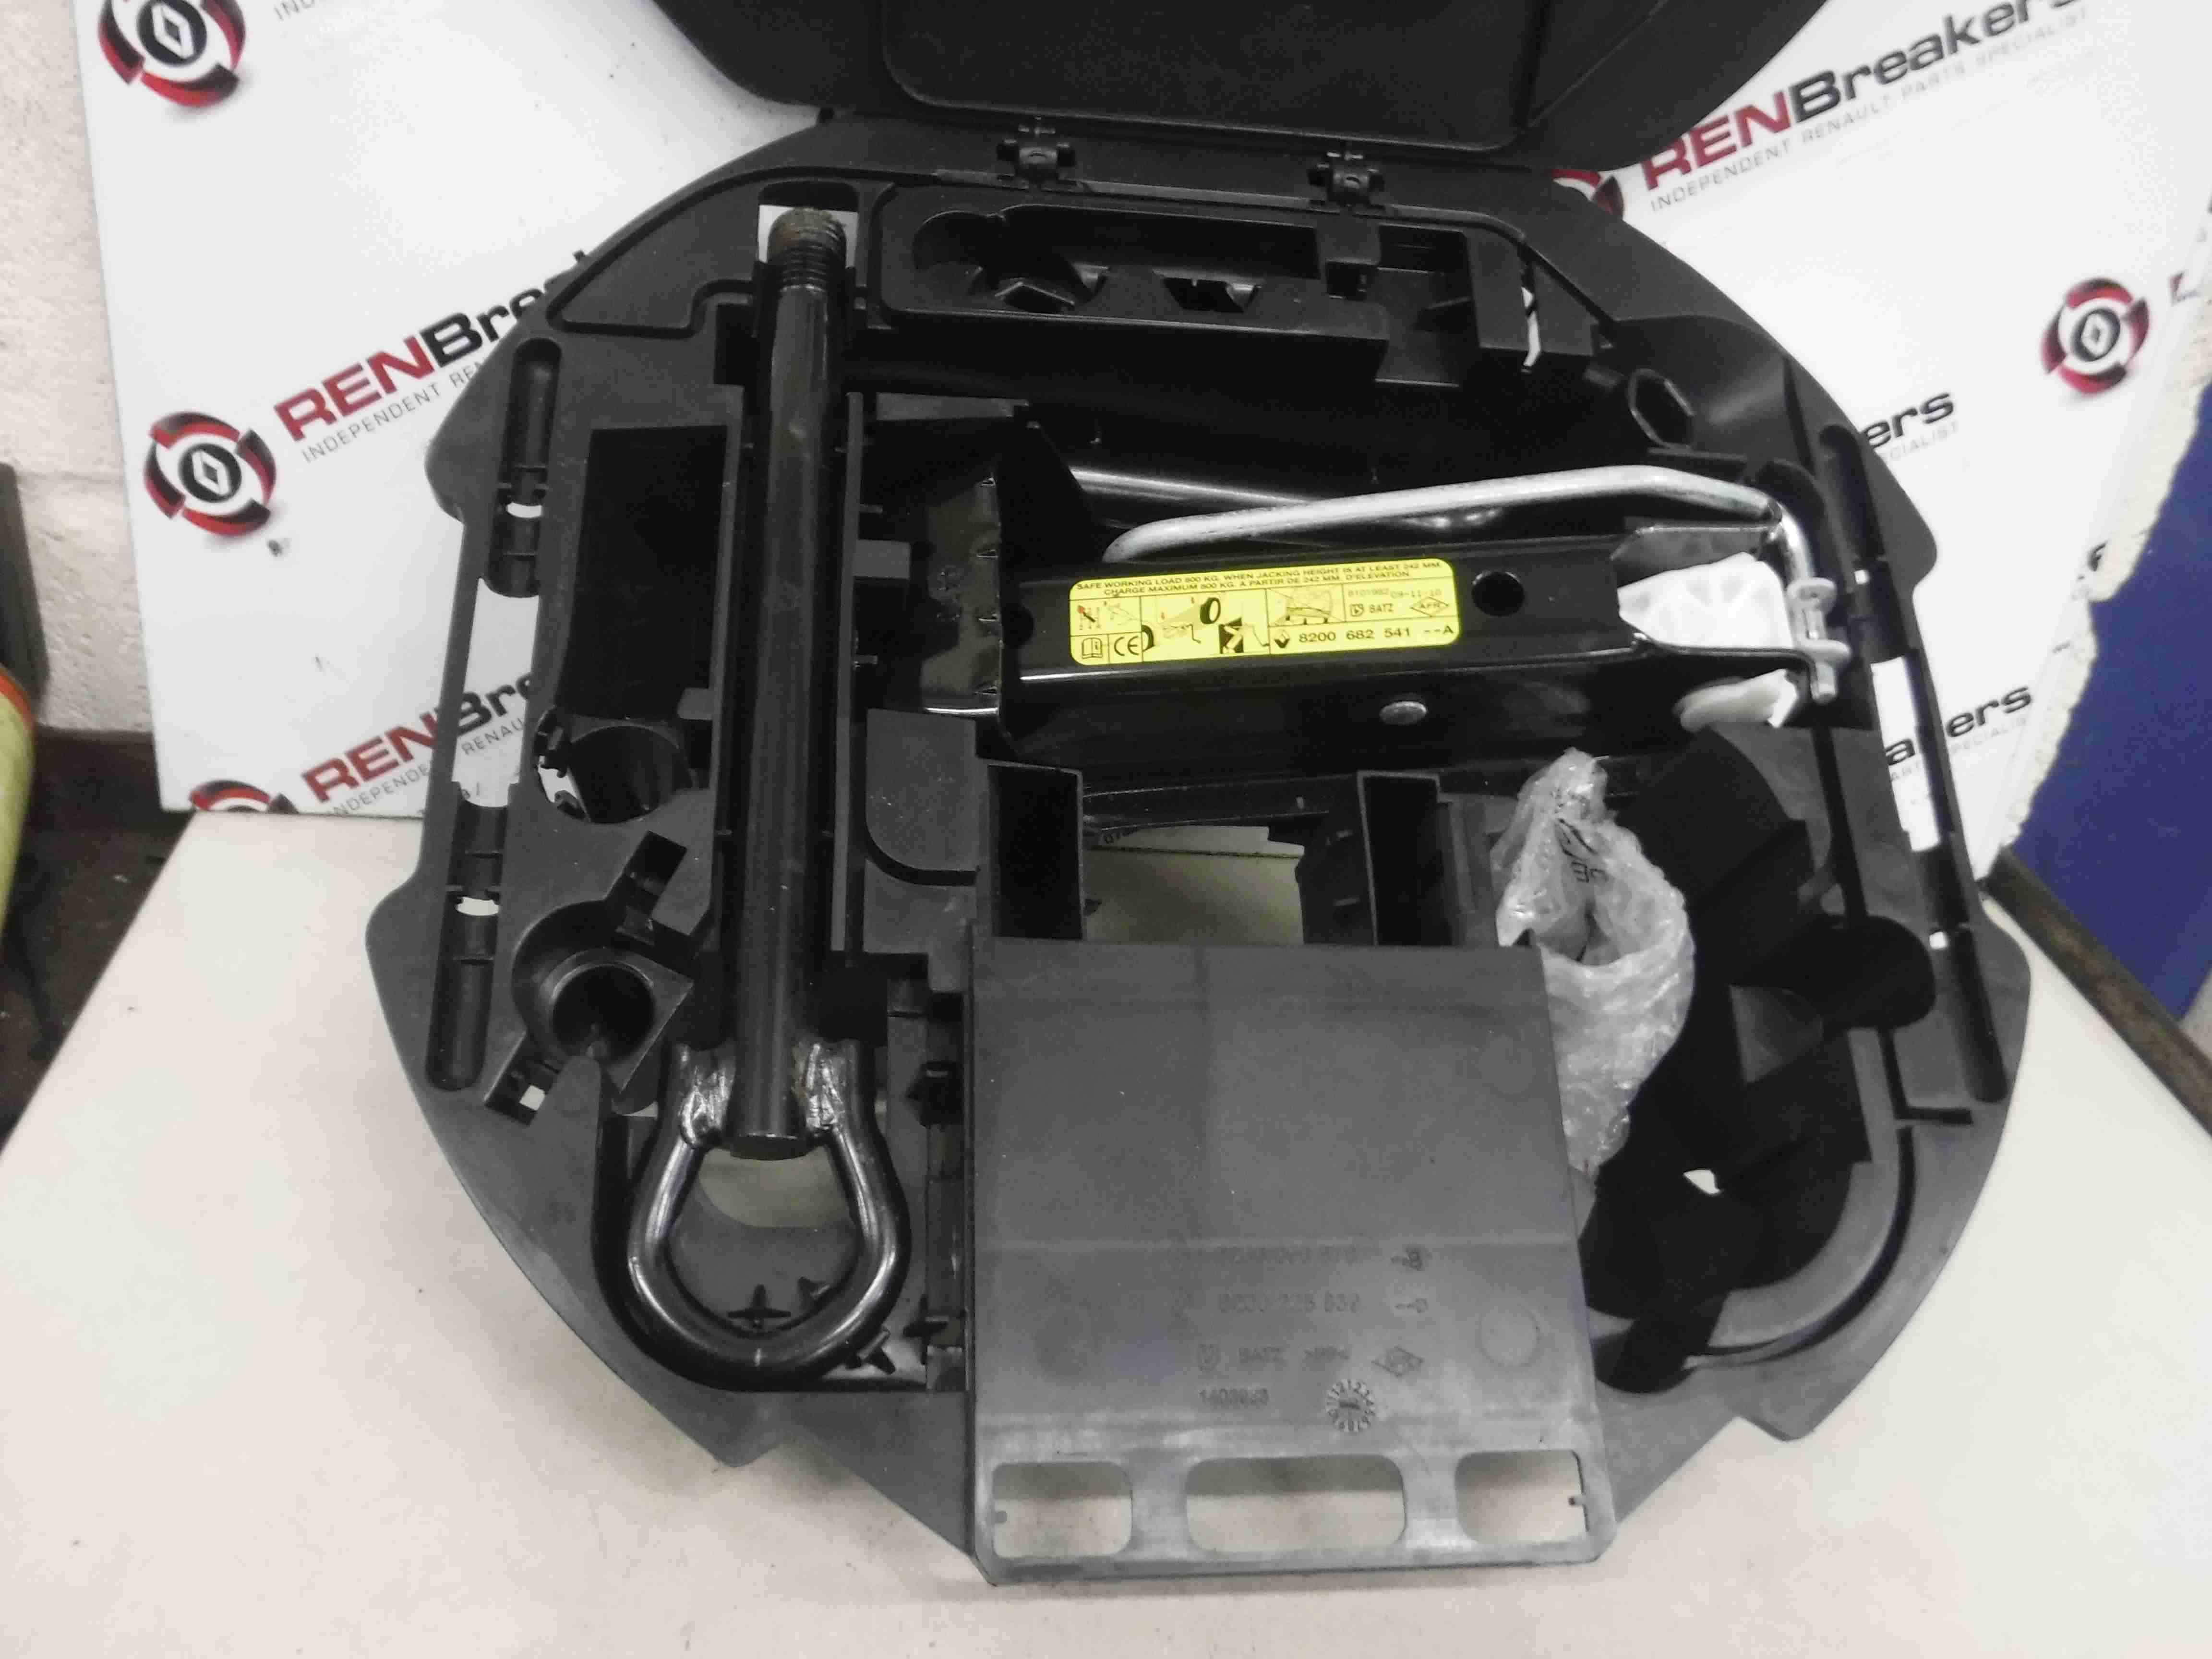 Renault Clio MK3  modus 2005-2012  Spare Wheel Jack Set 8200696876 8200225839